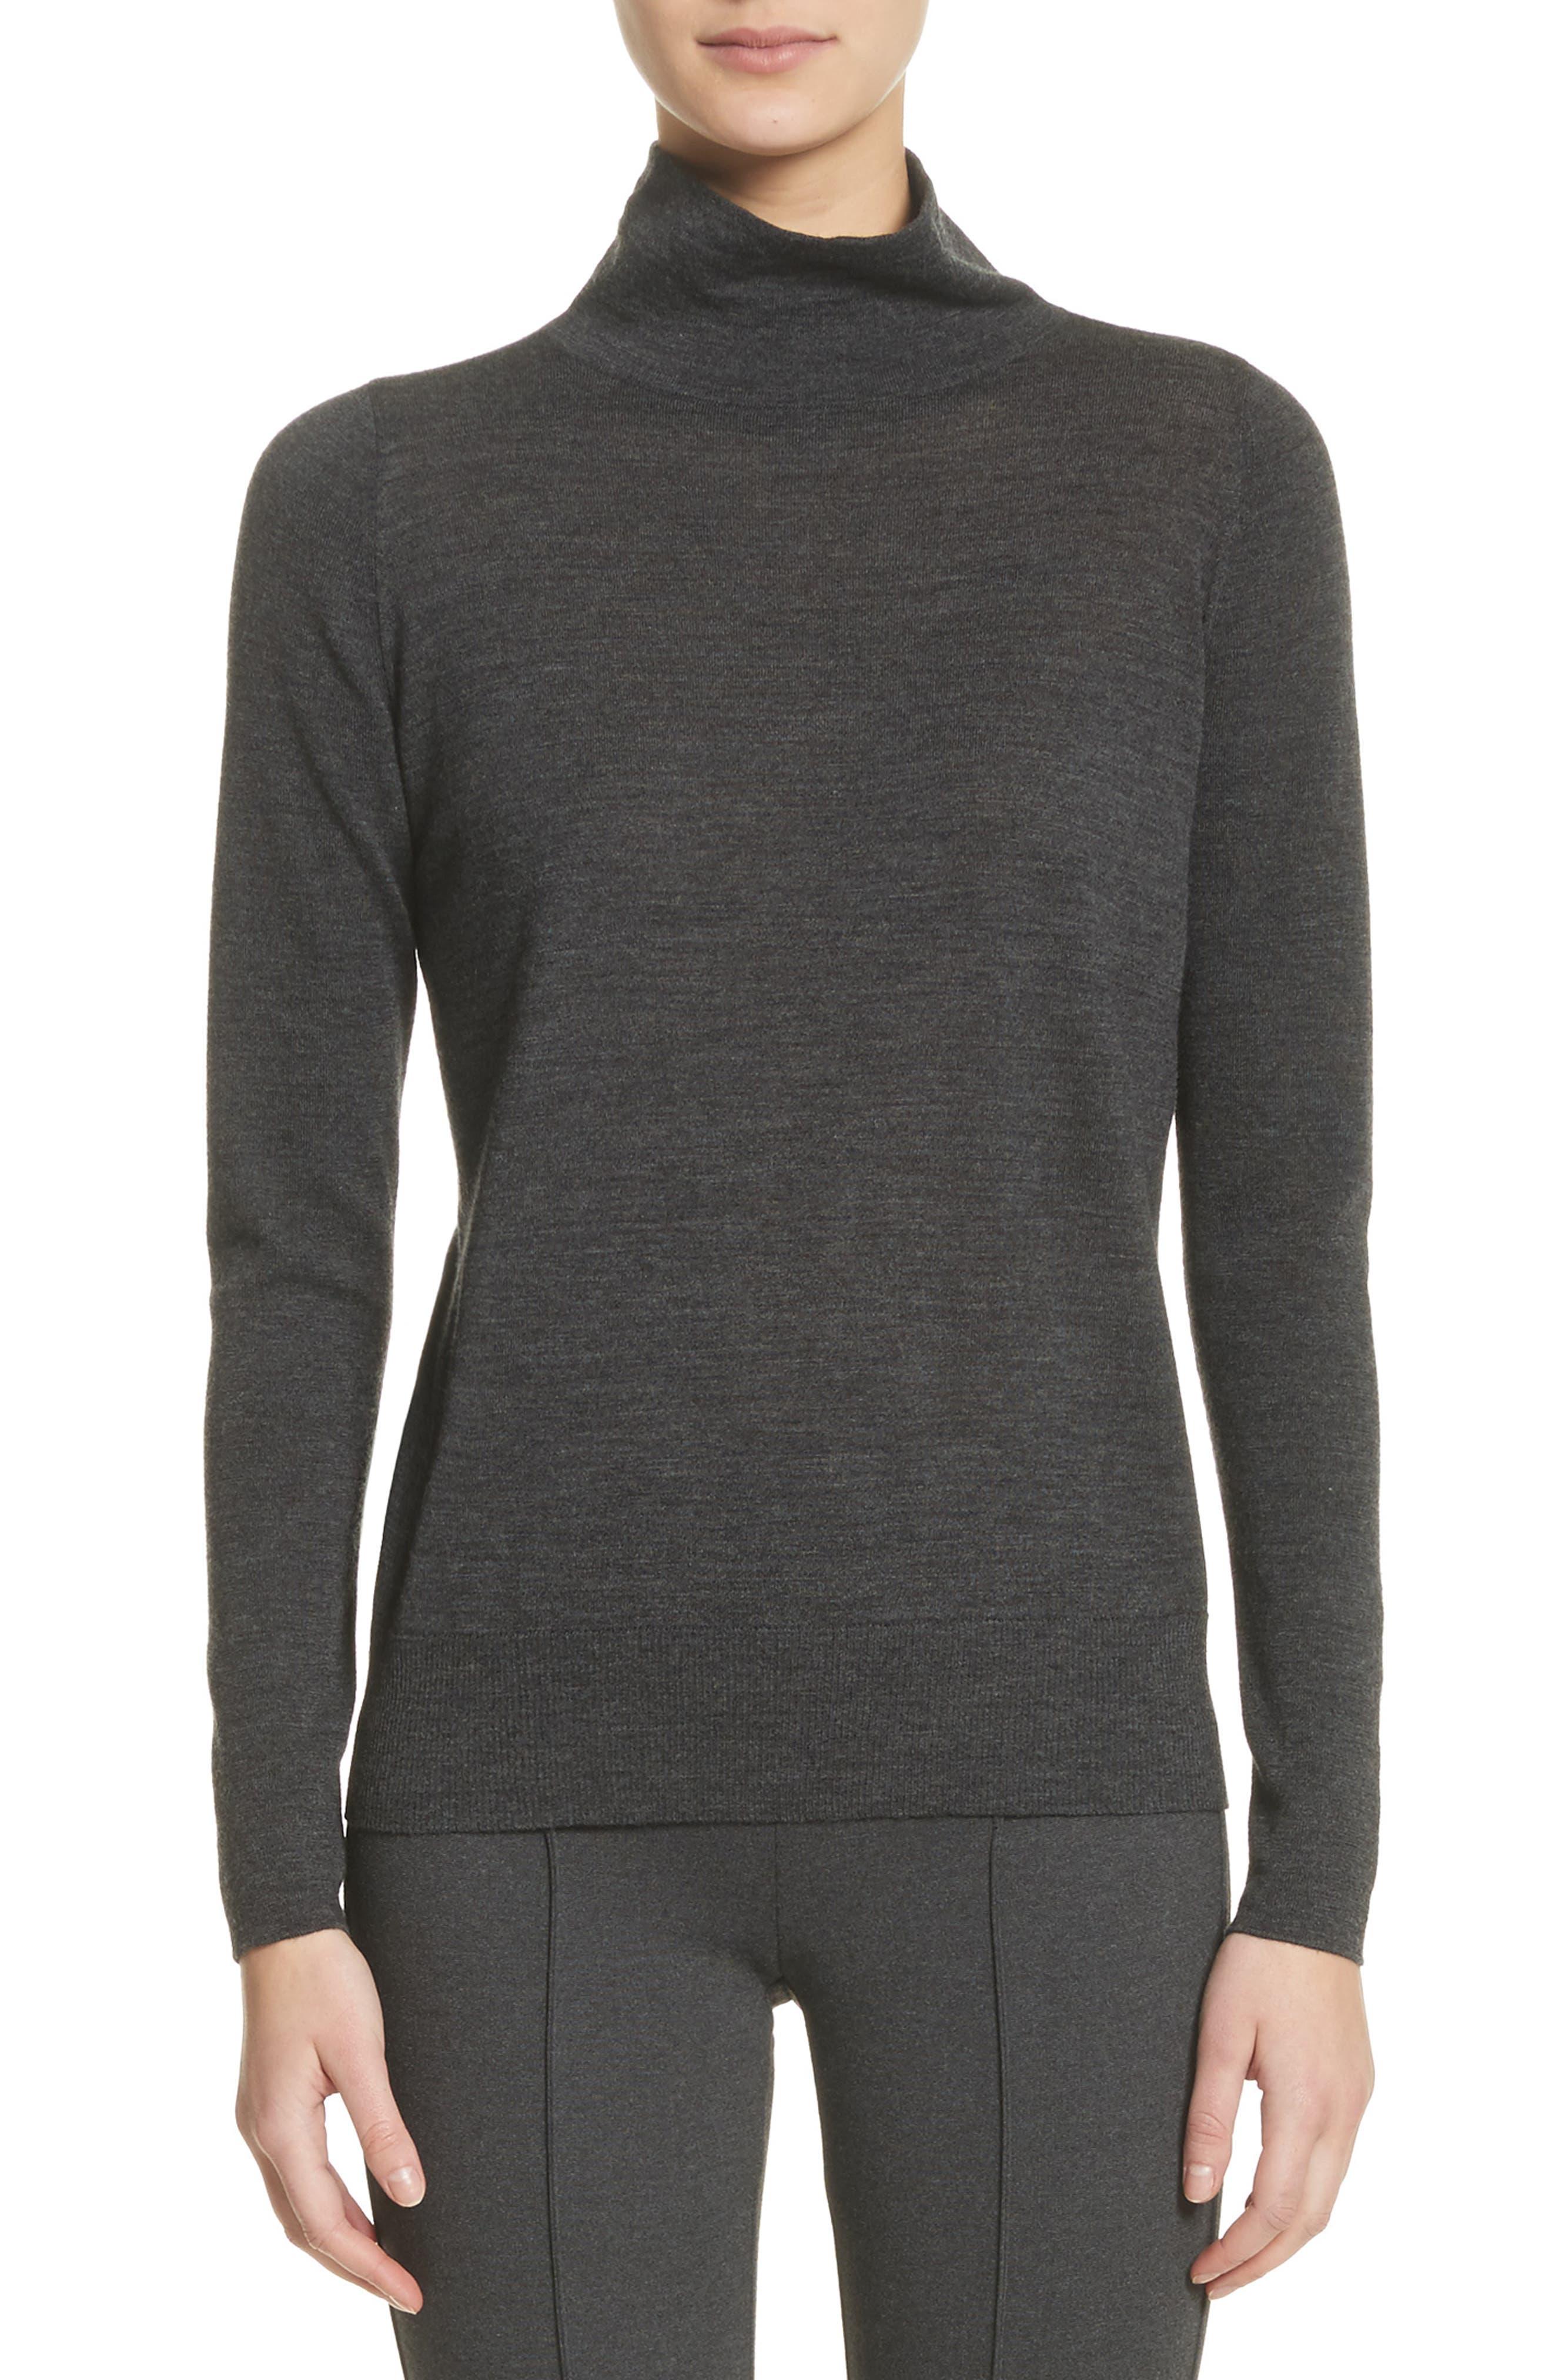 Lafayette 148 New York Merino Wool Modern Turtleneck Sweater